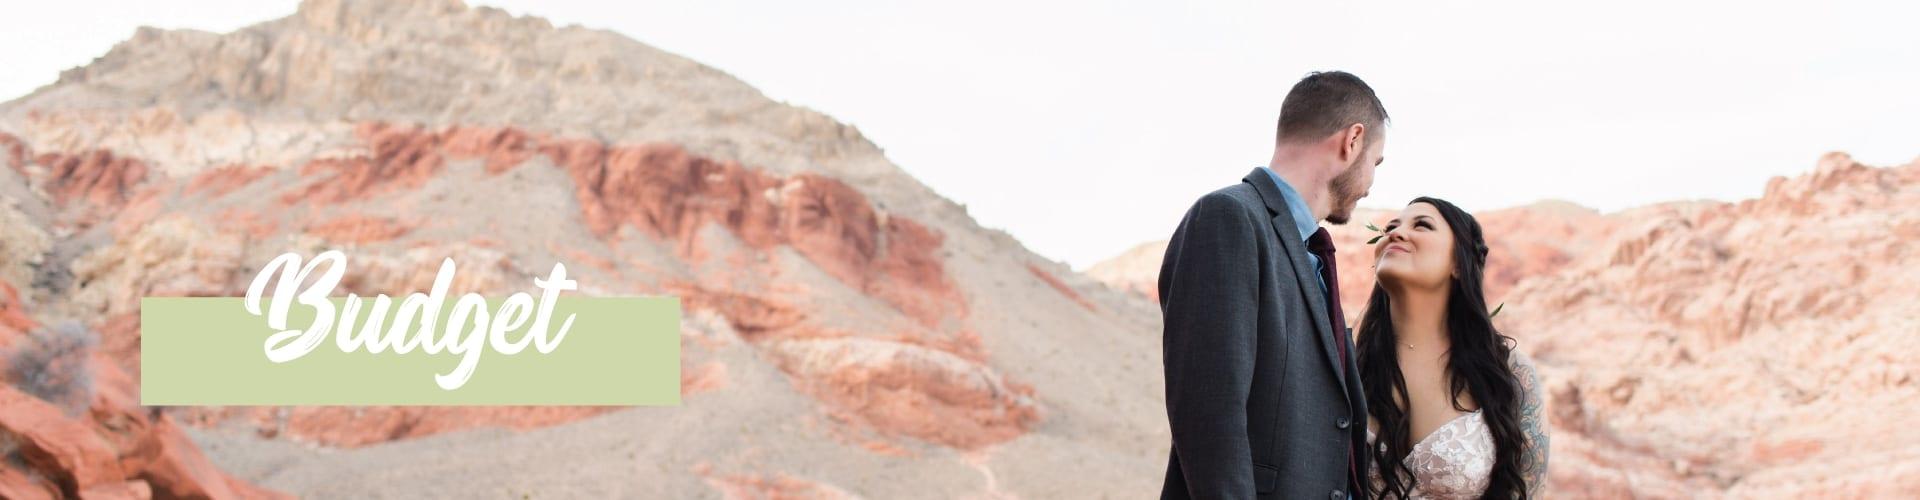 Finding a Great Las Vegas Wedding Photographer - Budget